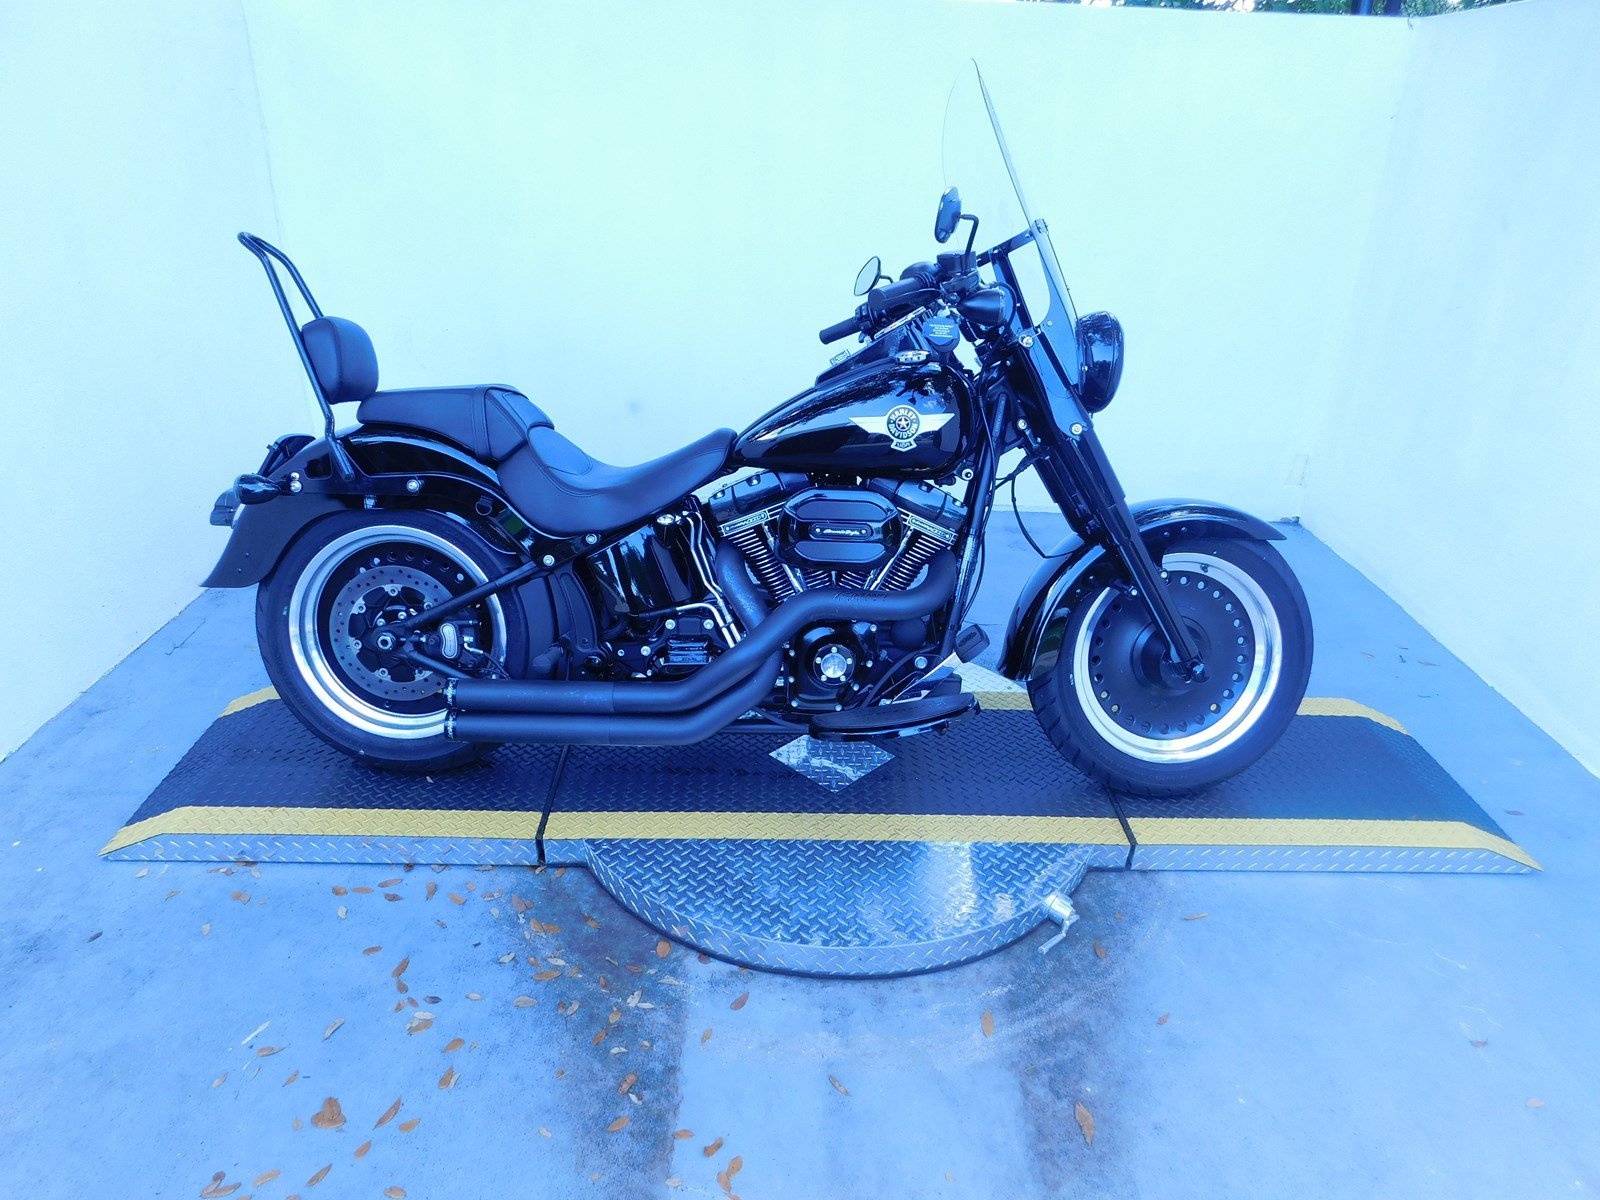 Pre-Owned 2017 Harley-Davidson Softail Fat Boy S FLSTFBS